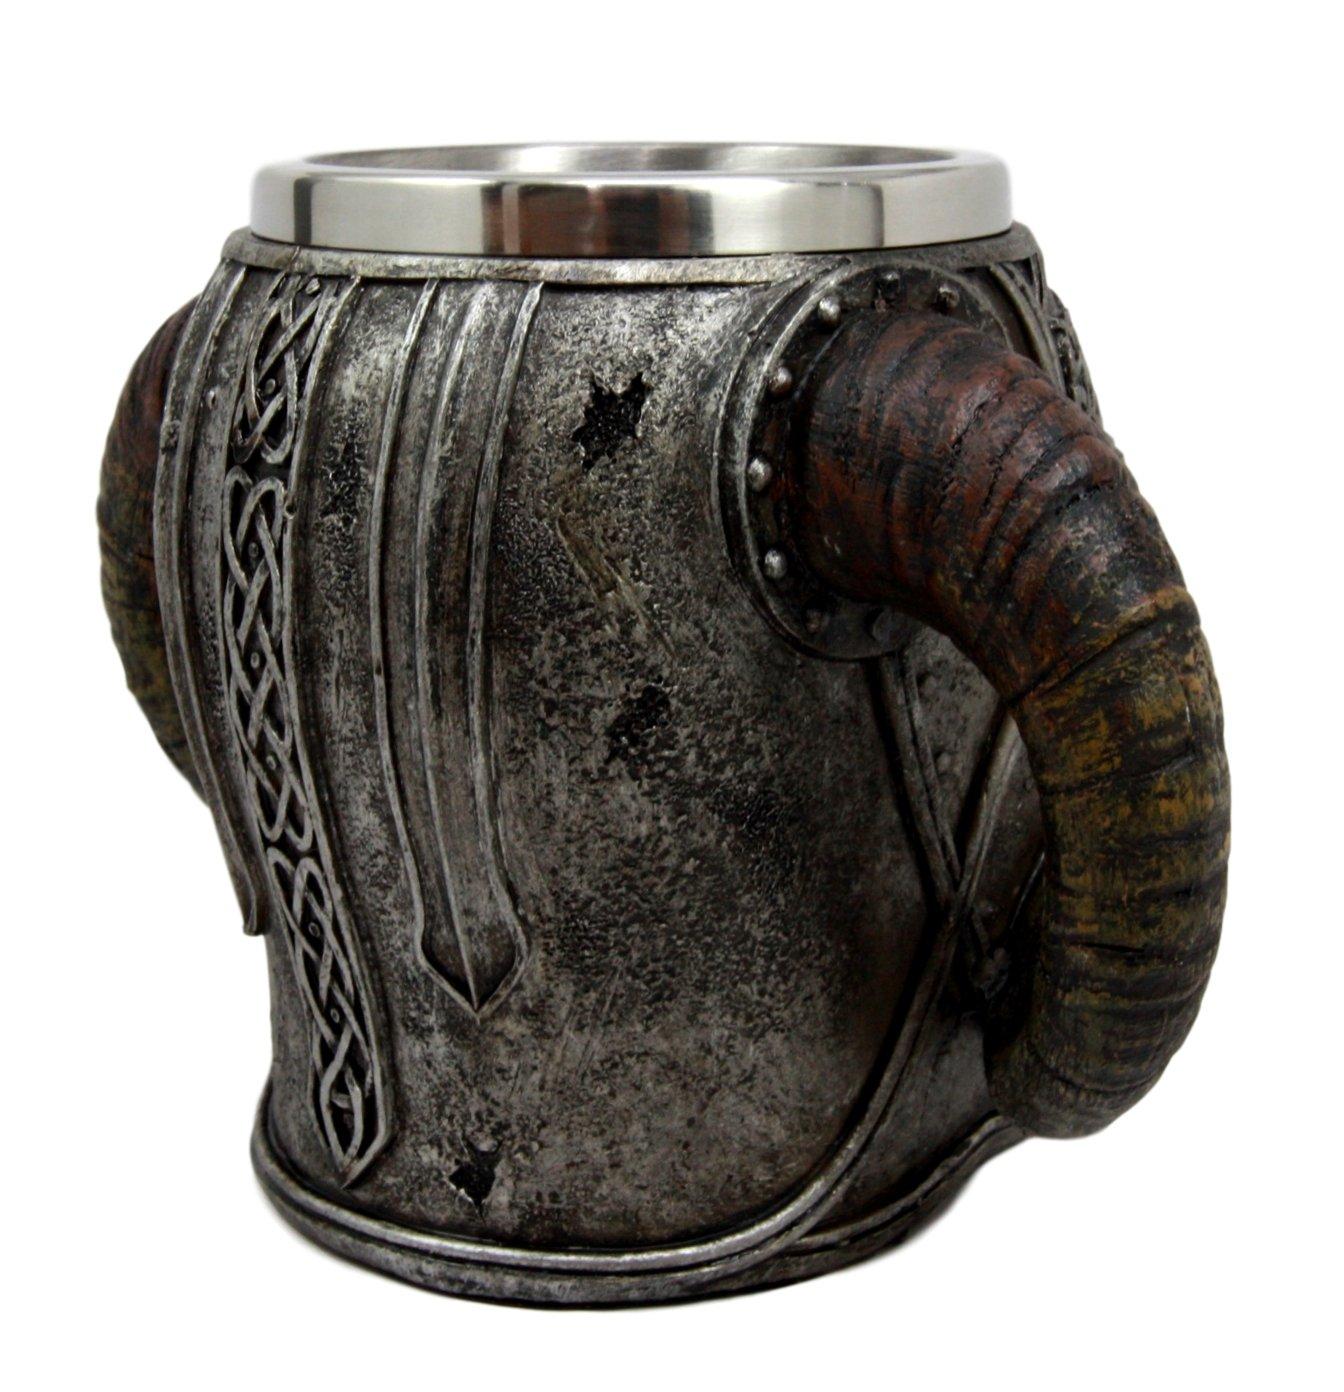 Ebros Gift Viking Ram Horned Pit Lord Warrior Skull With Battle Helmet Beer Stein Tankard Coffee Cup Mug 13oz Norse…